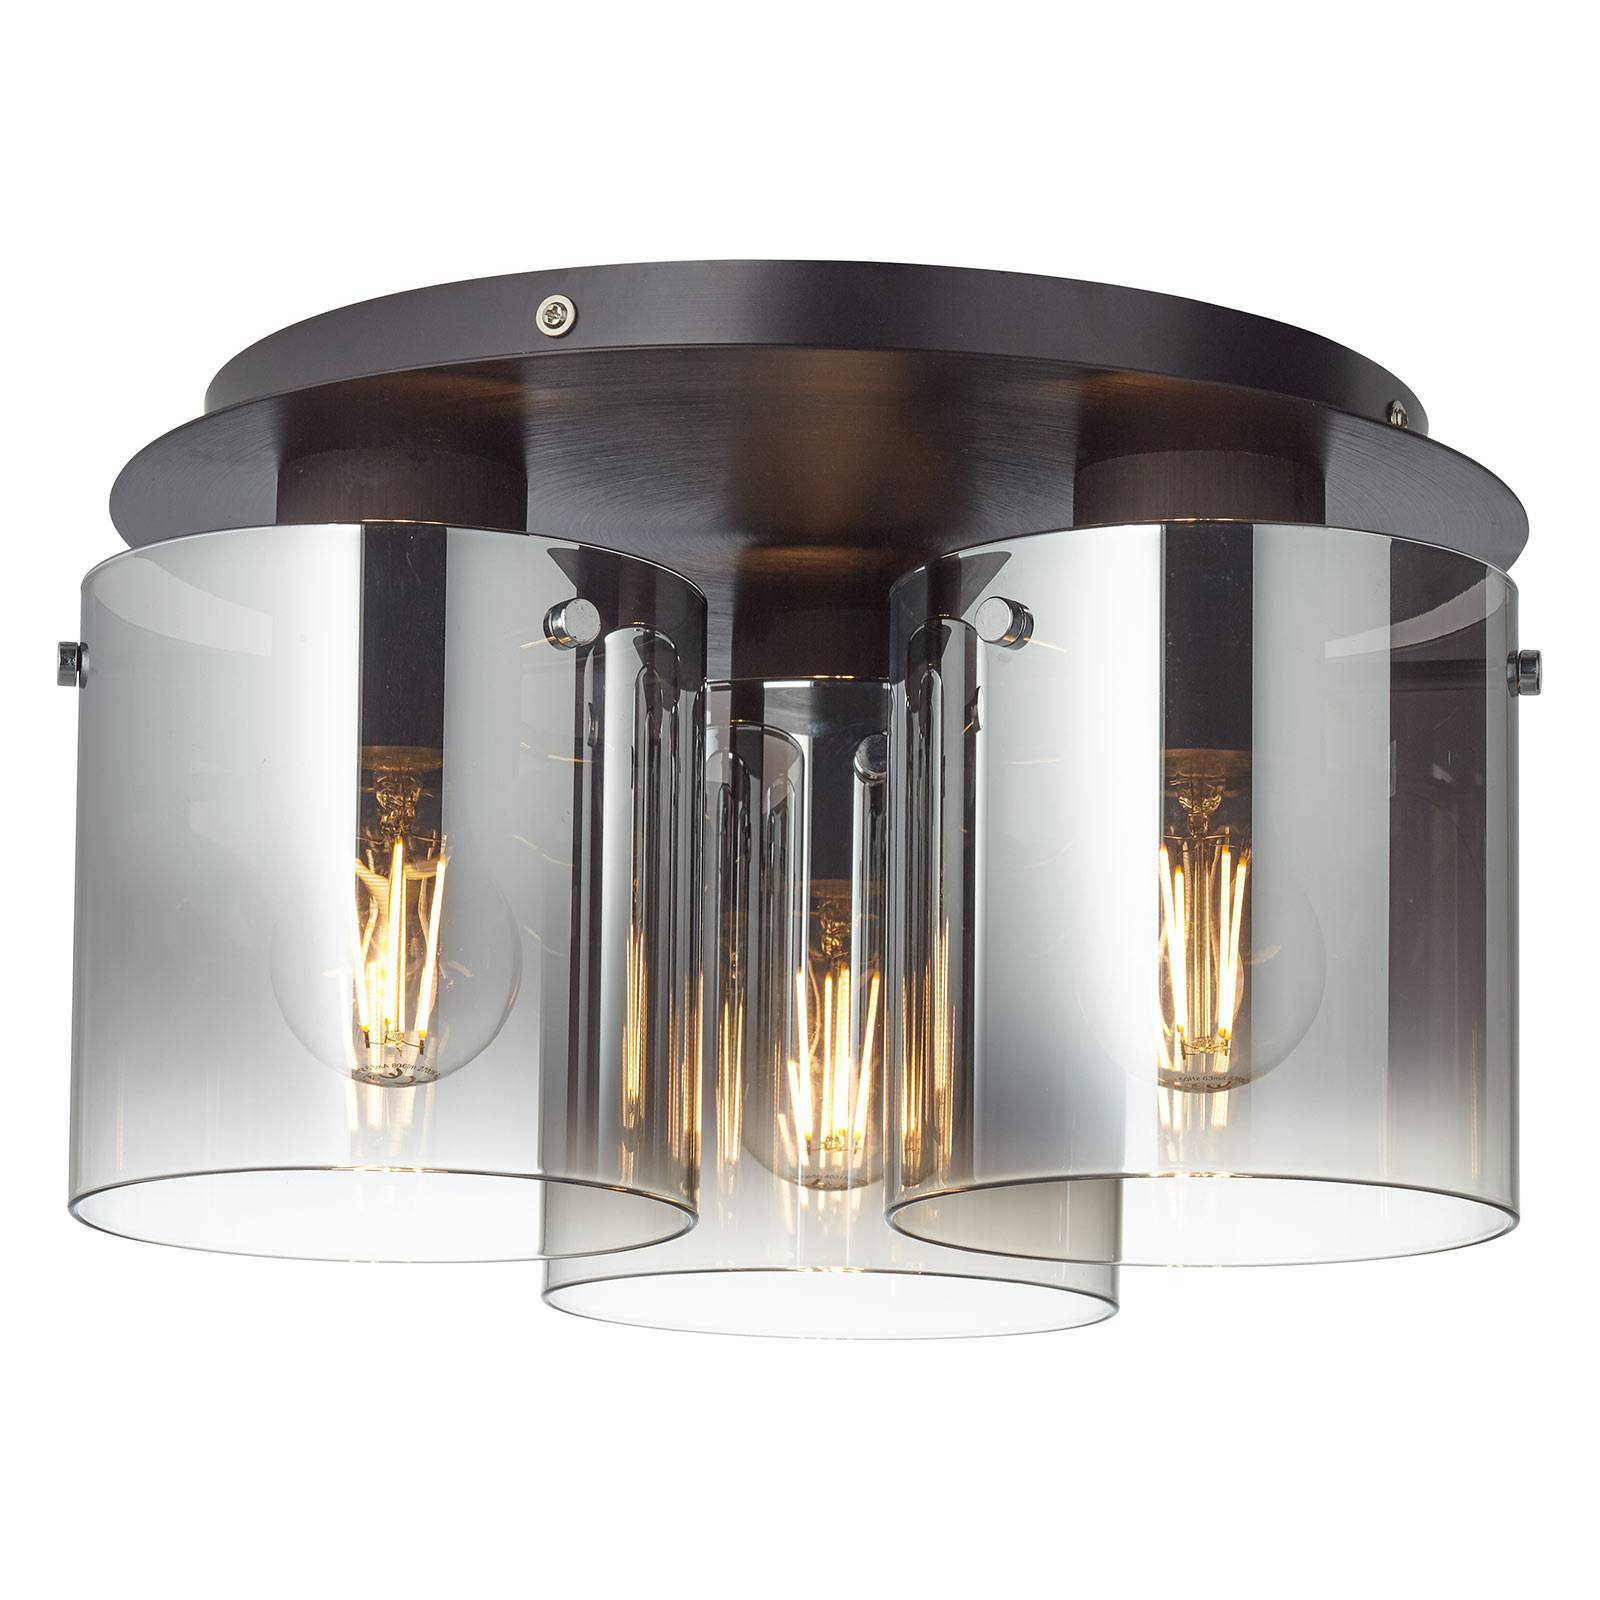 Plafondlamp Beth met rookglas, 3-lamps